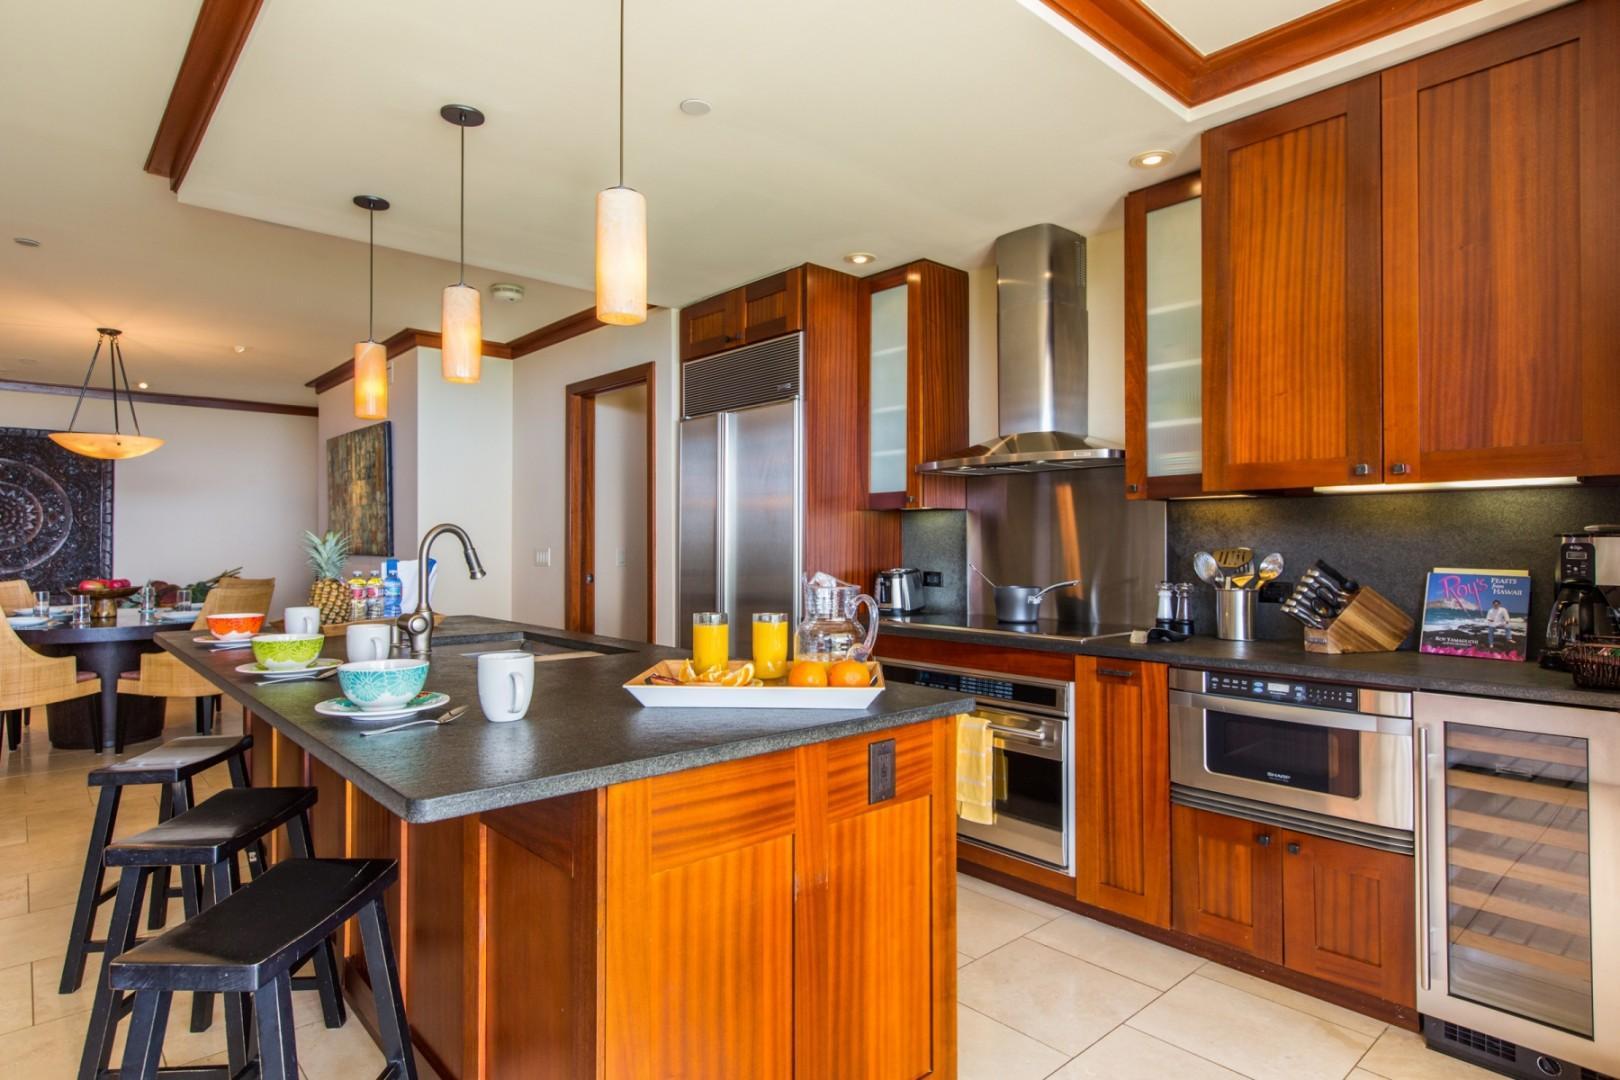 Gourmet kitchen designed by Hawaii chef Roy Yamaguchi; SubZero fridge/freezer, Wolf oven and glass cooktop, Sharp microwave drawer, Fischer & Paykel dishwasher drawers, SubZero wine cooler